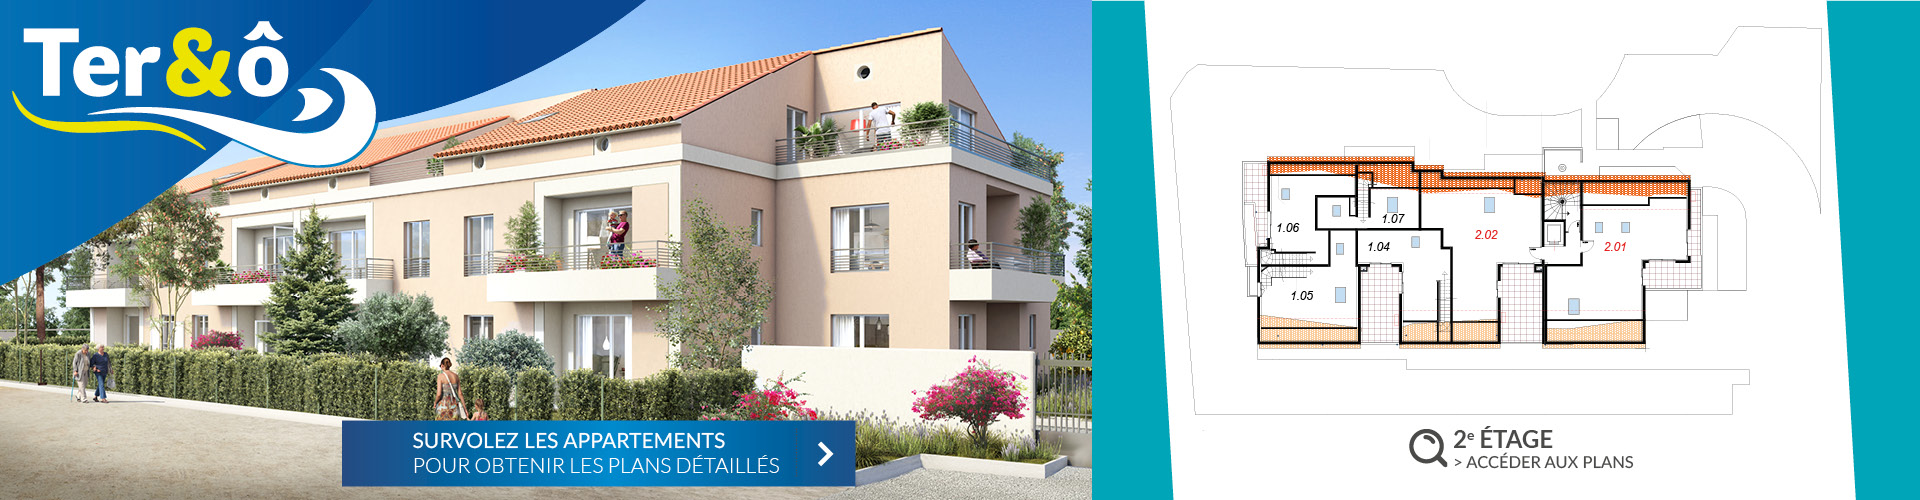 2e étage - Résidence immobilière Ter&O - La Garde - Var - 83